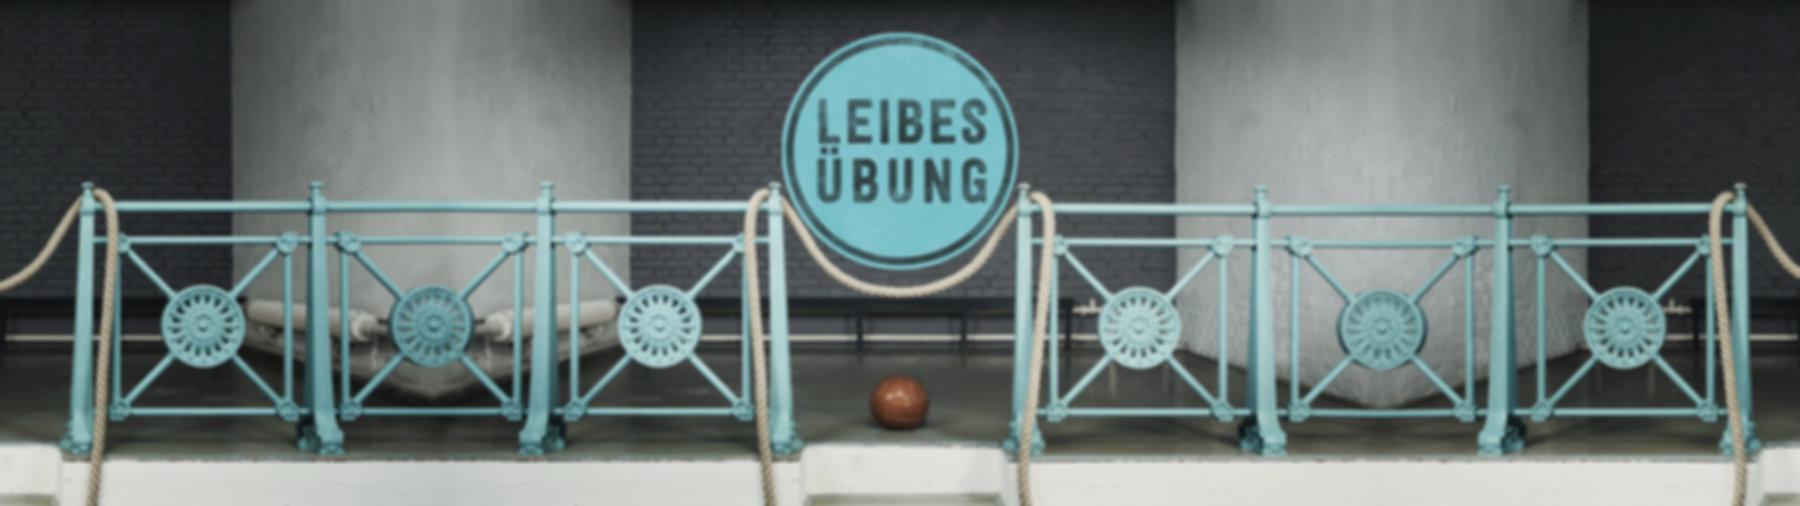 Leibesübung Lindengasse